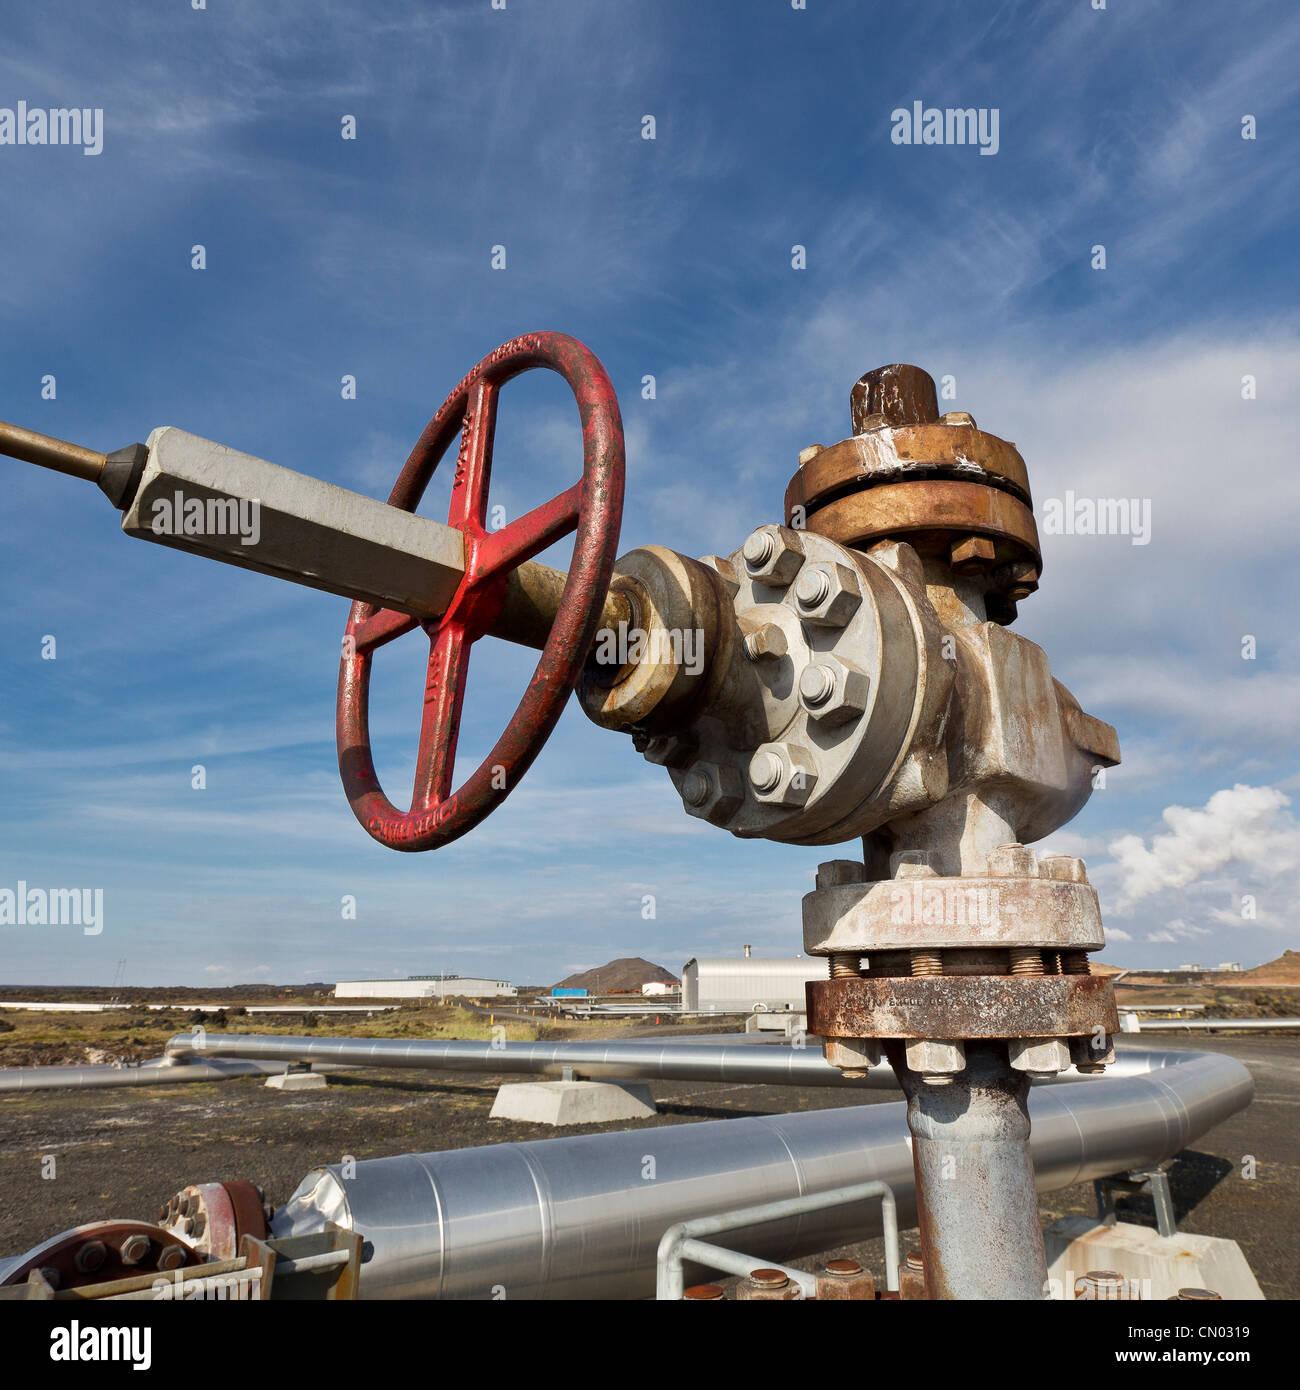 Pipes at Gunnhver Reykjanes Geothermal Power Plant, Reykjanes Peninsula, Iceland - Stock Image